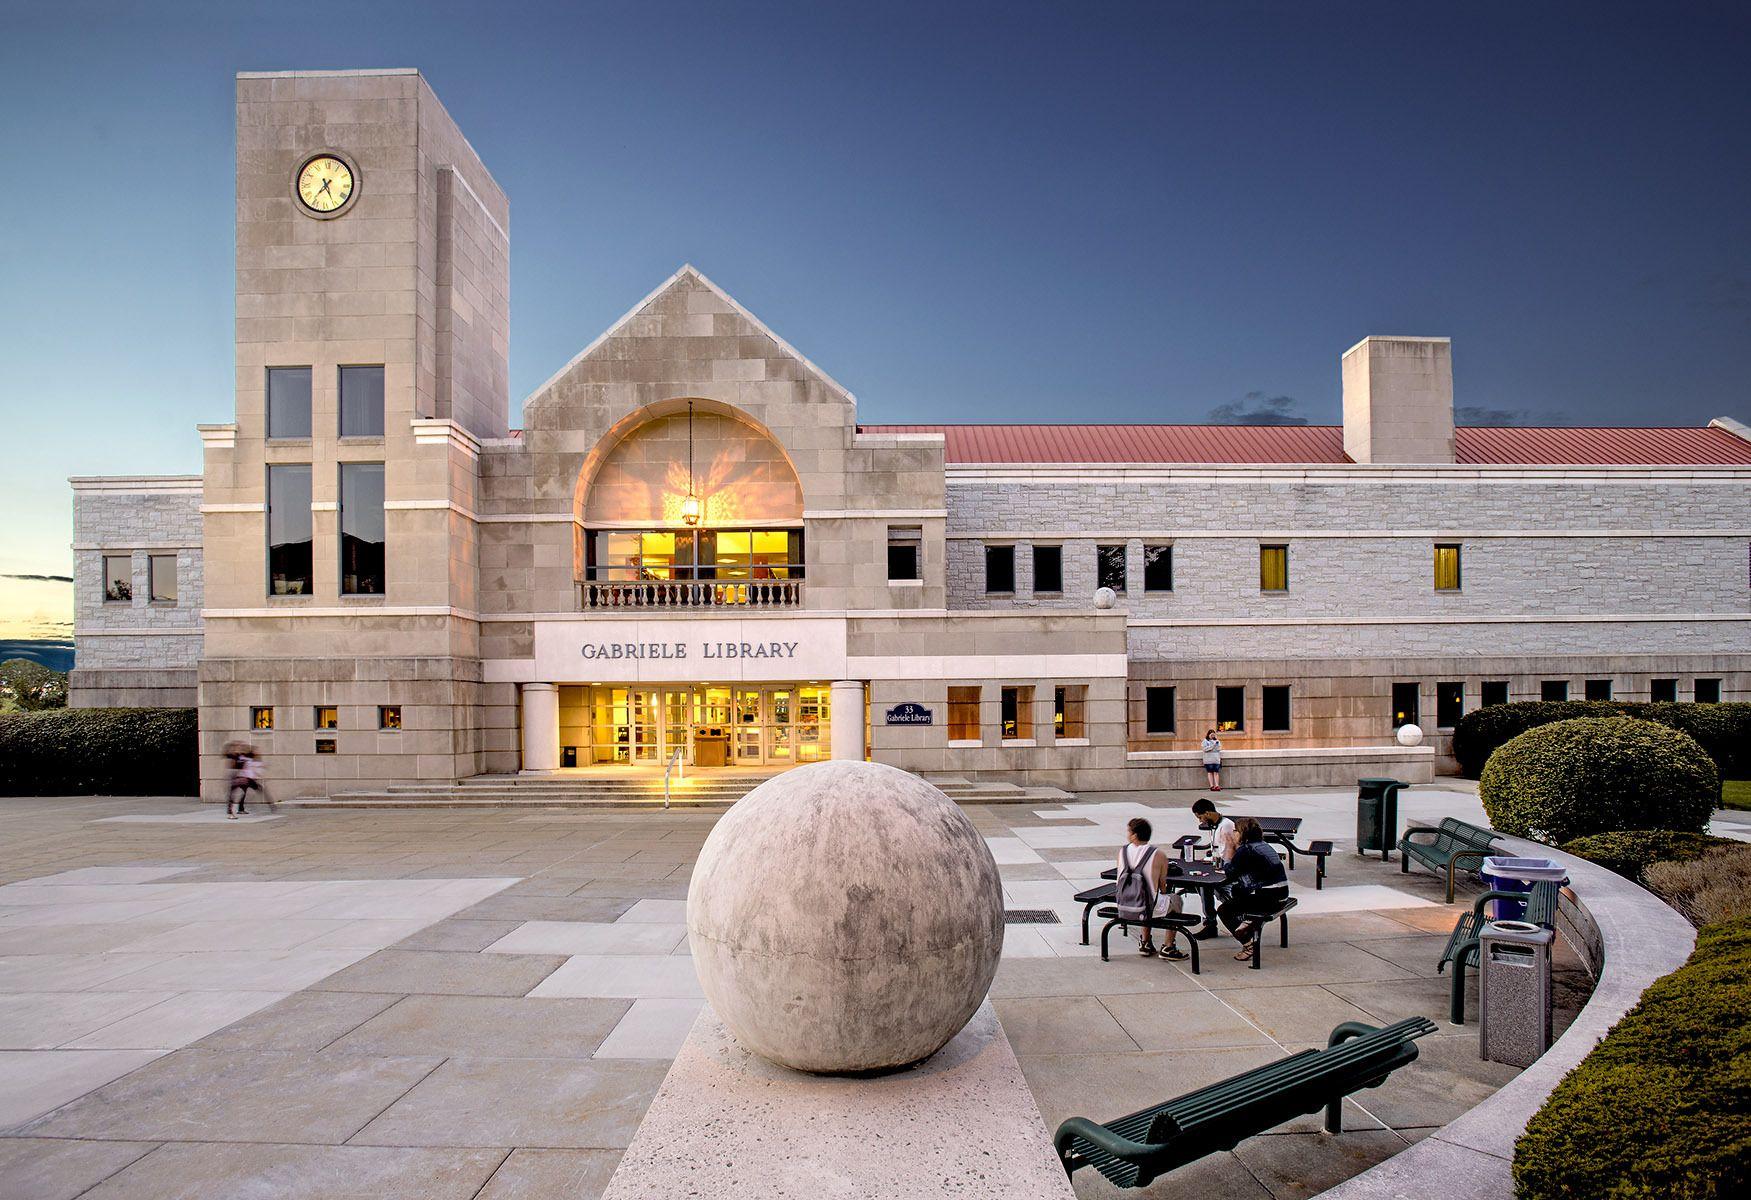 Gabriele  Library,  Immaculata  Univ., Frazer,  PA